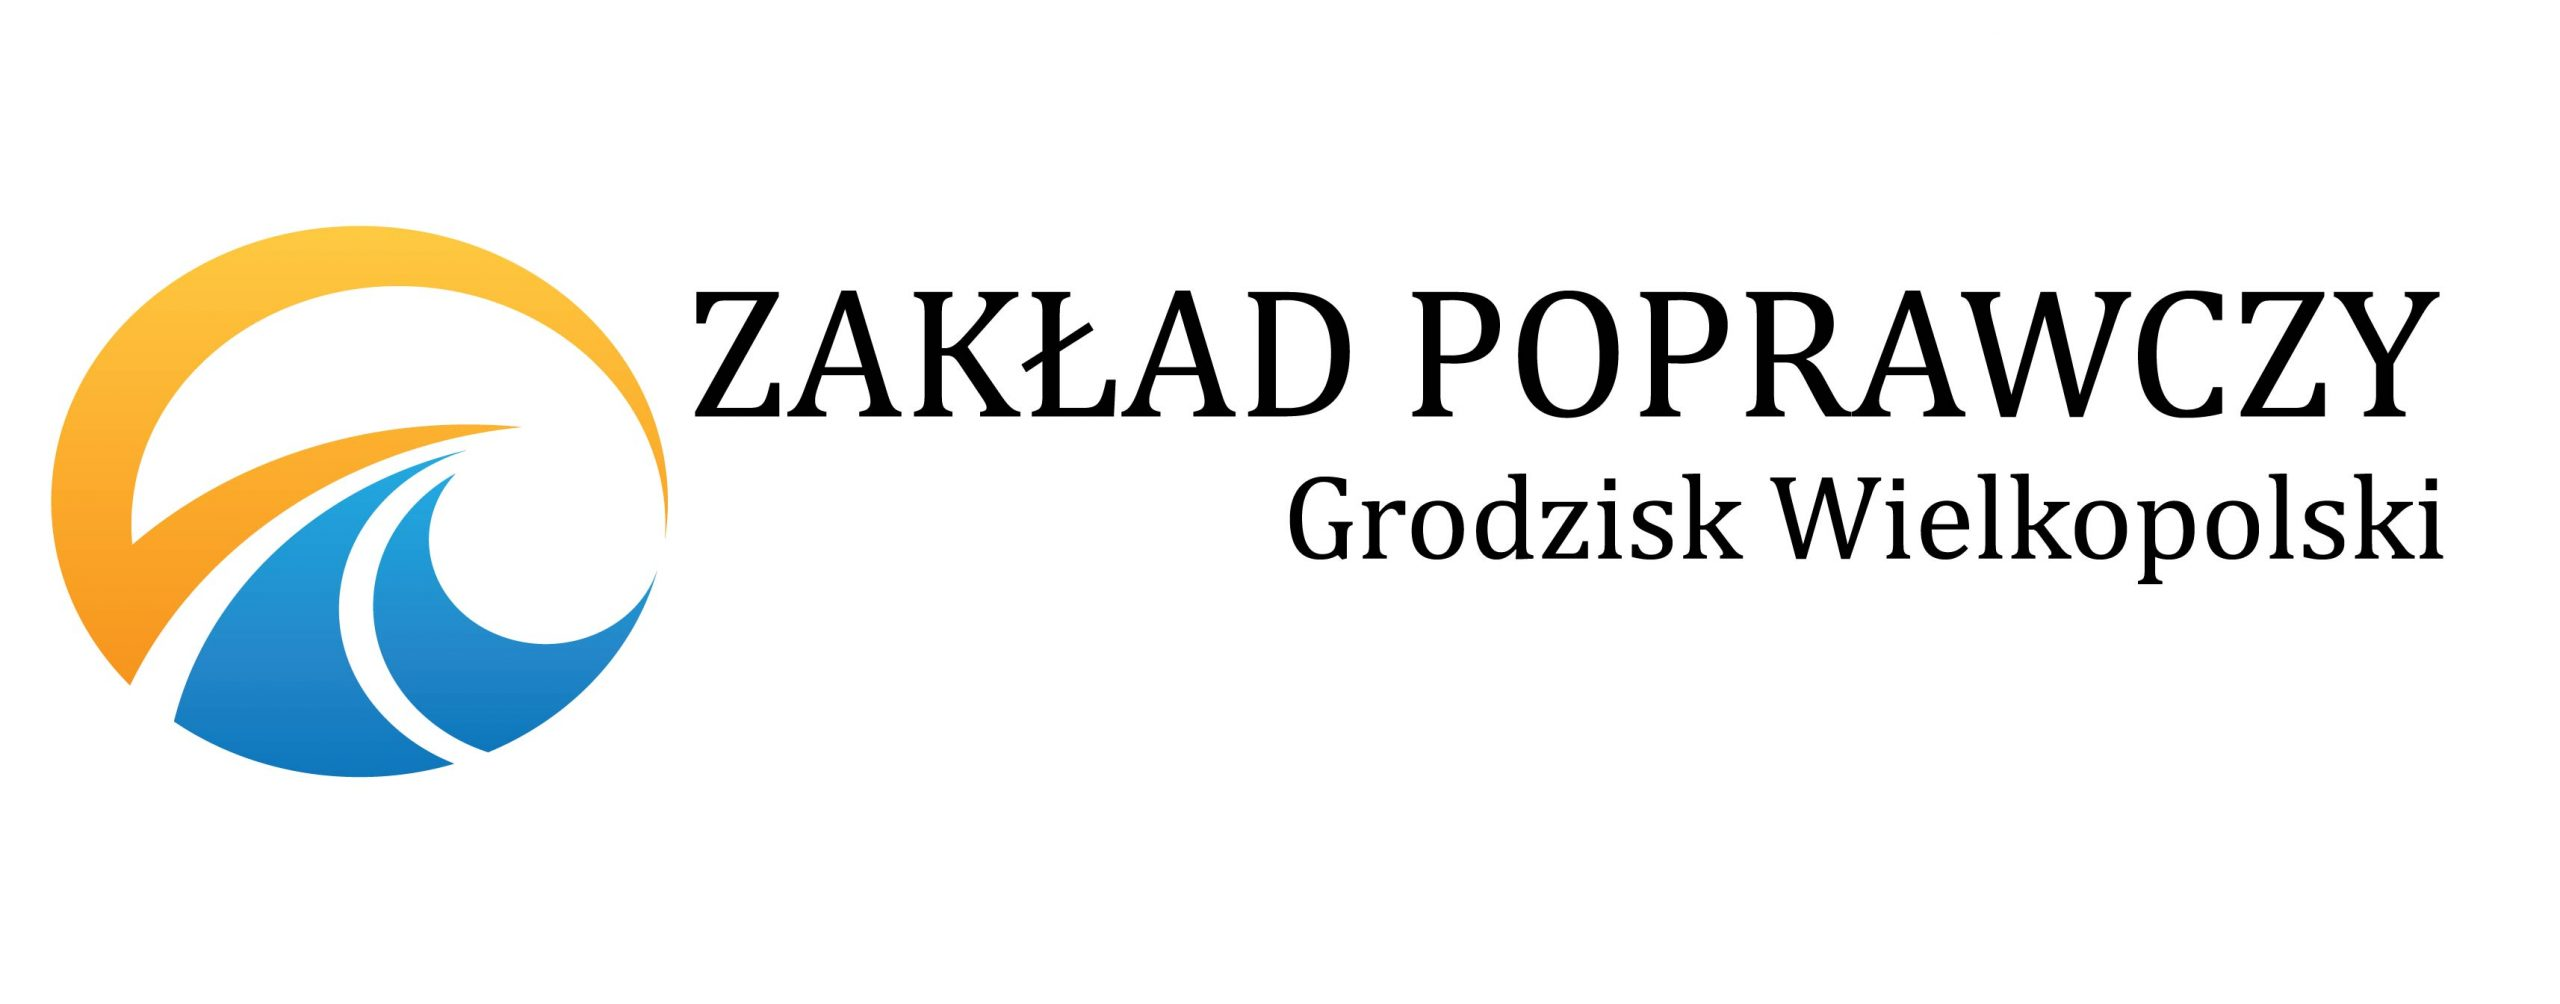 ZP Grodzisk